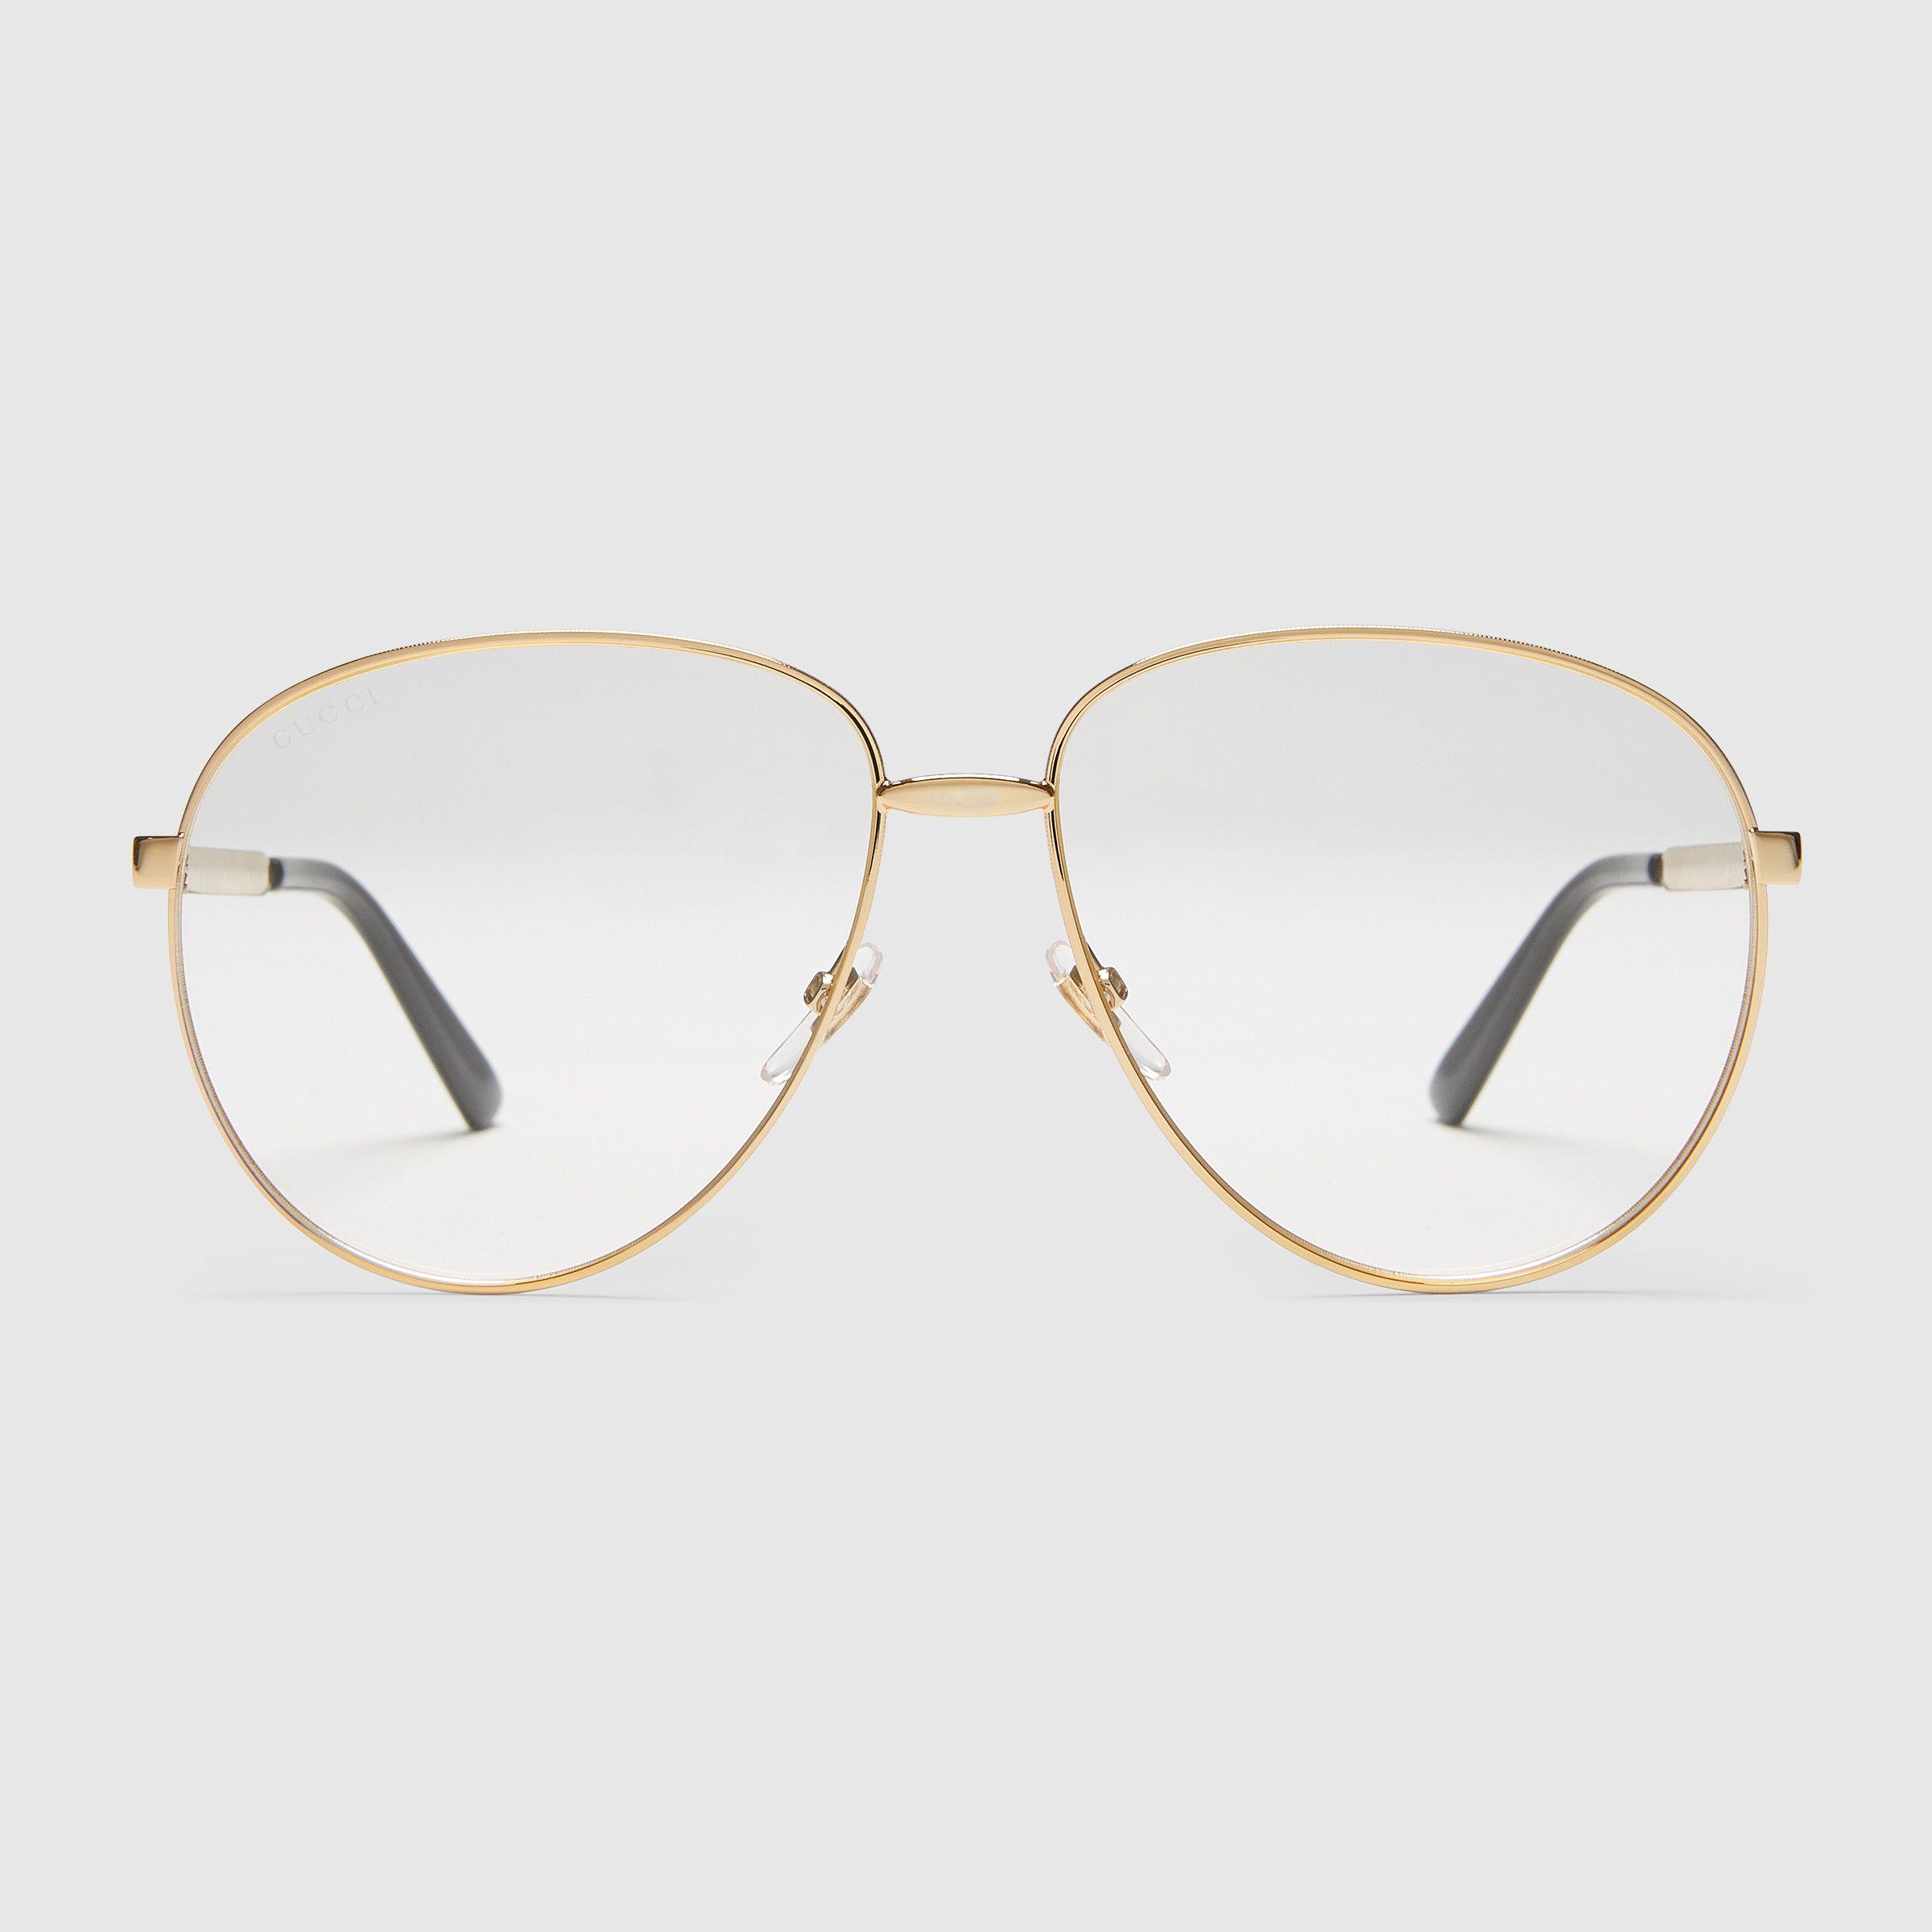 Aviator metal glasses with Web | Pinterest